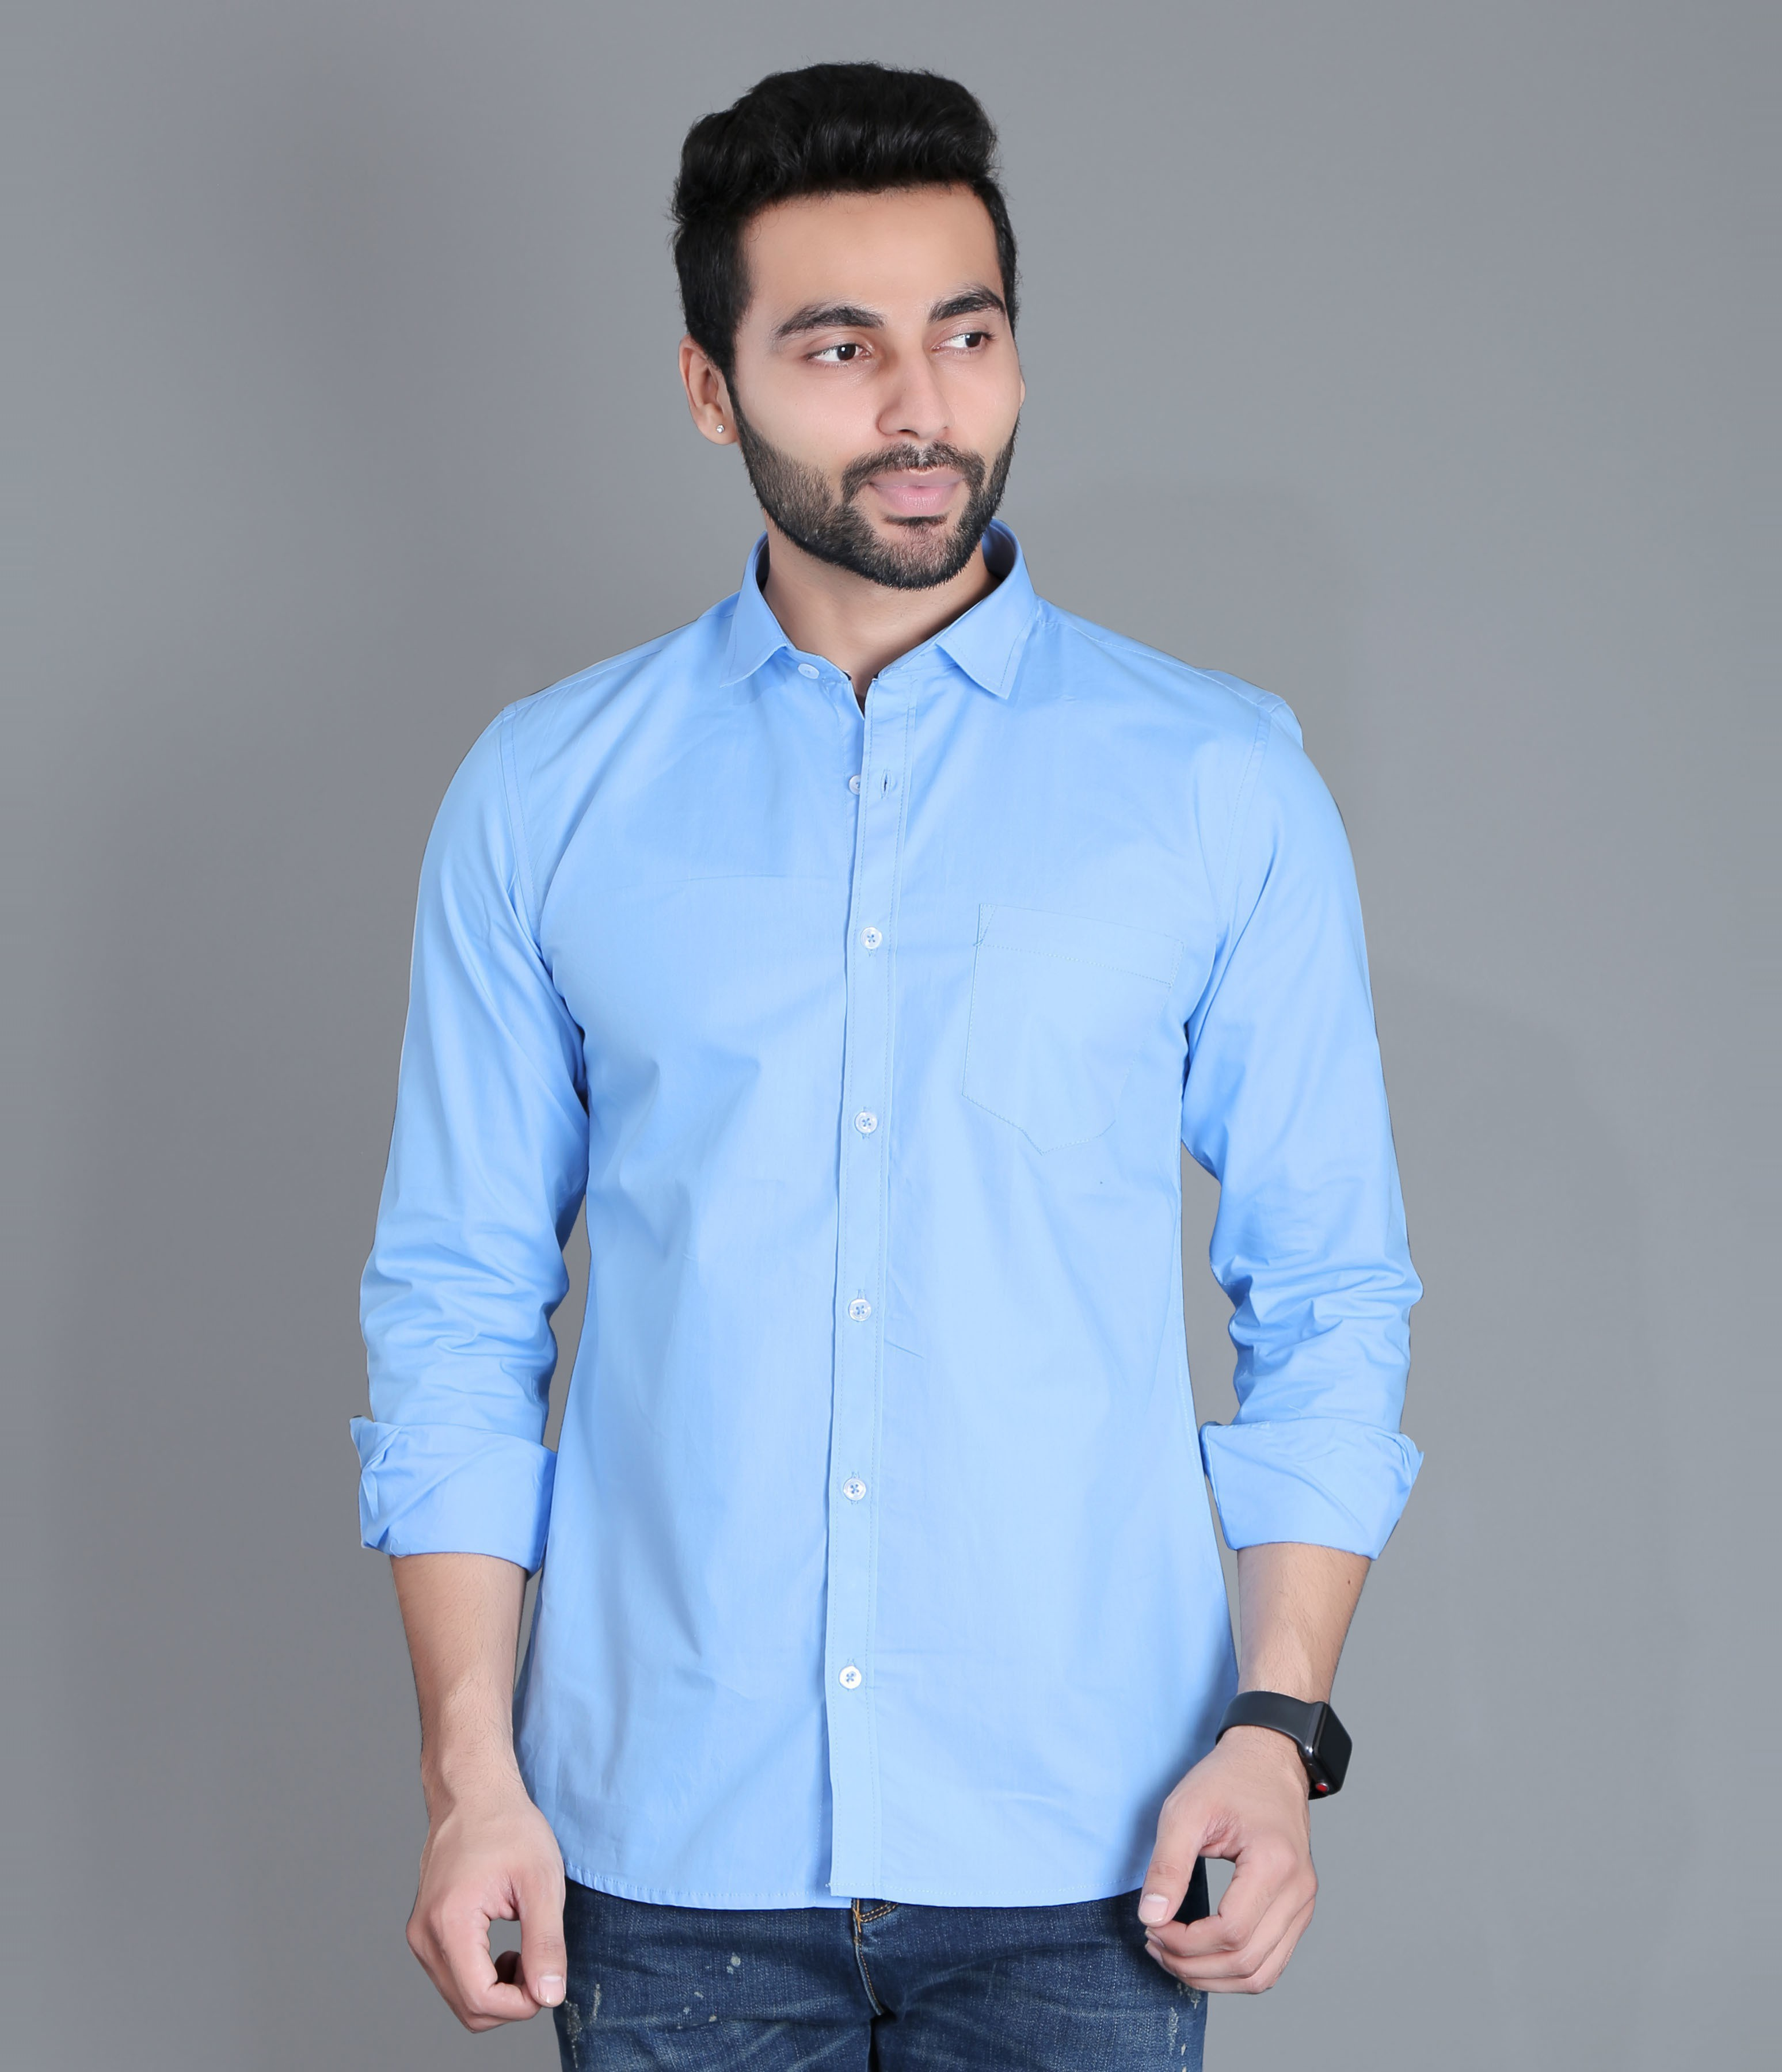 FIFTH ANFOLD Men's Sky Blue Casual Slim Collar Full/Long Sleev Slim Fit Shirt